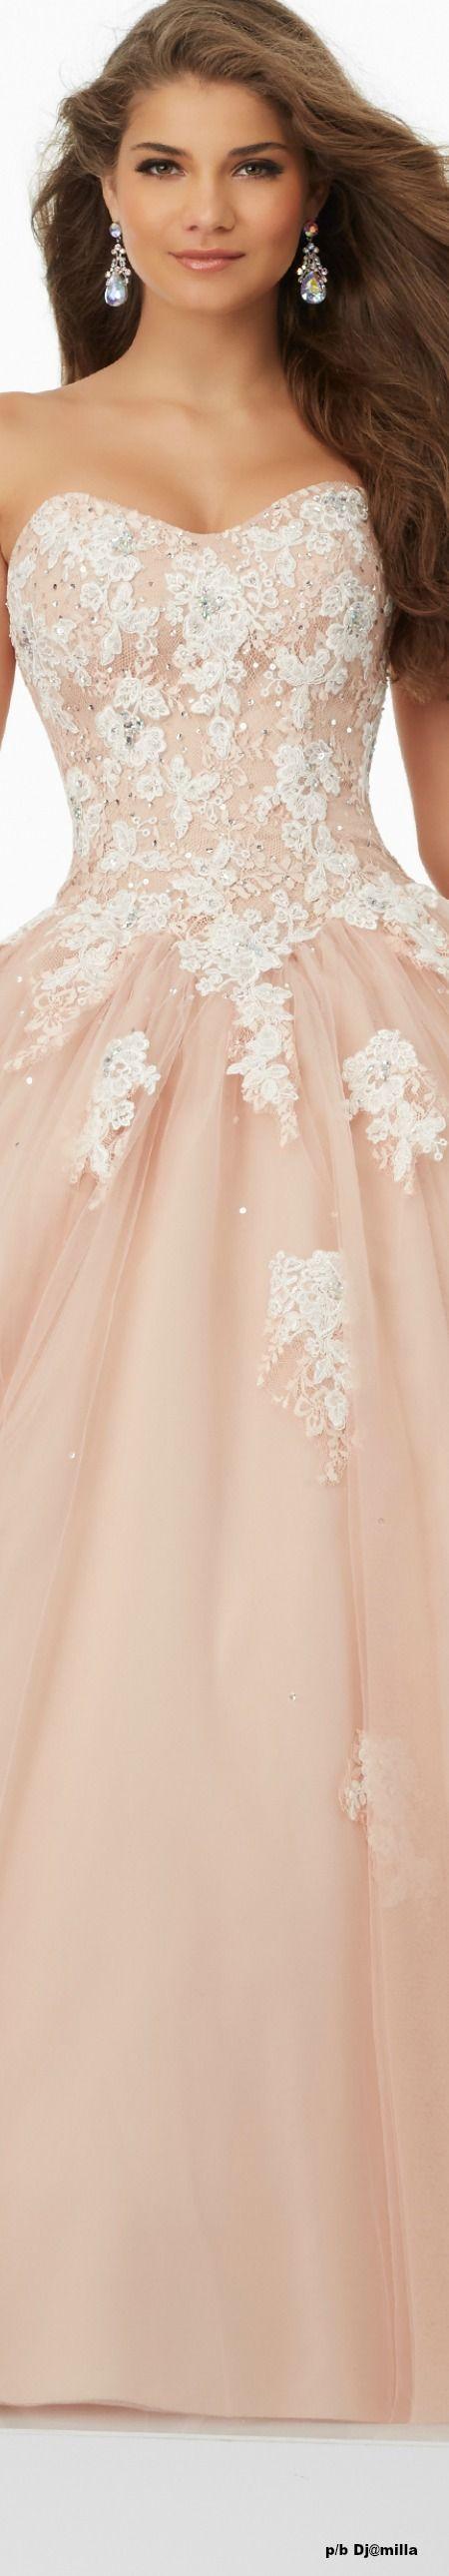 best lindos vest images on pinterest evening gowns